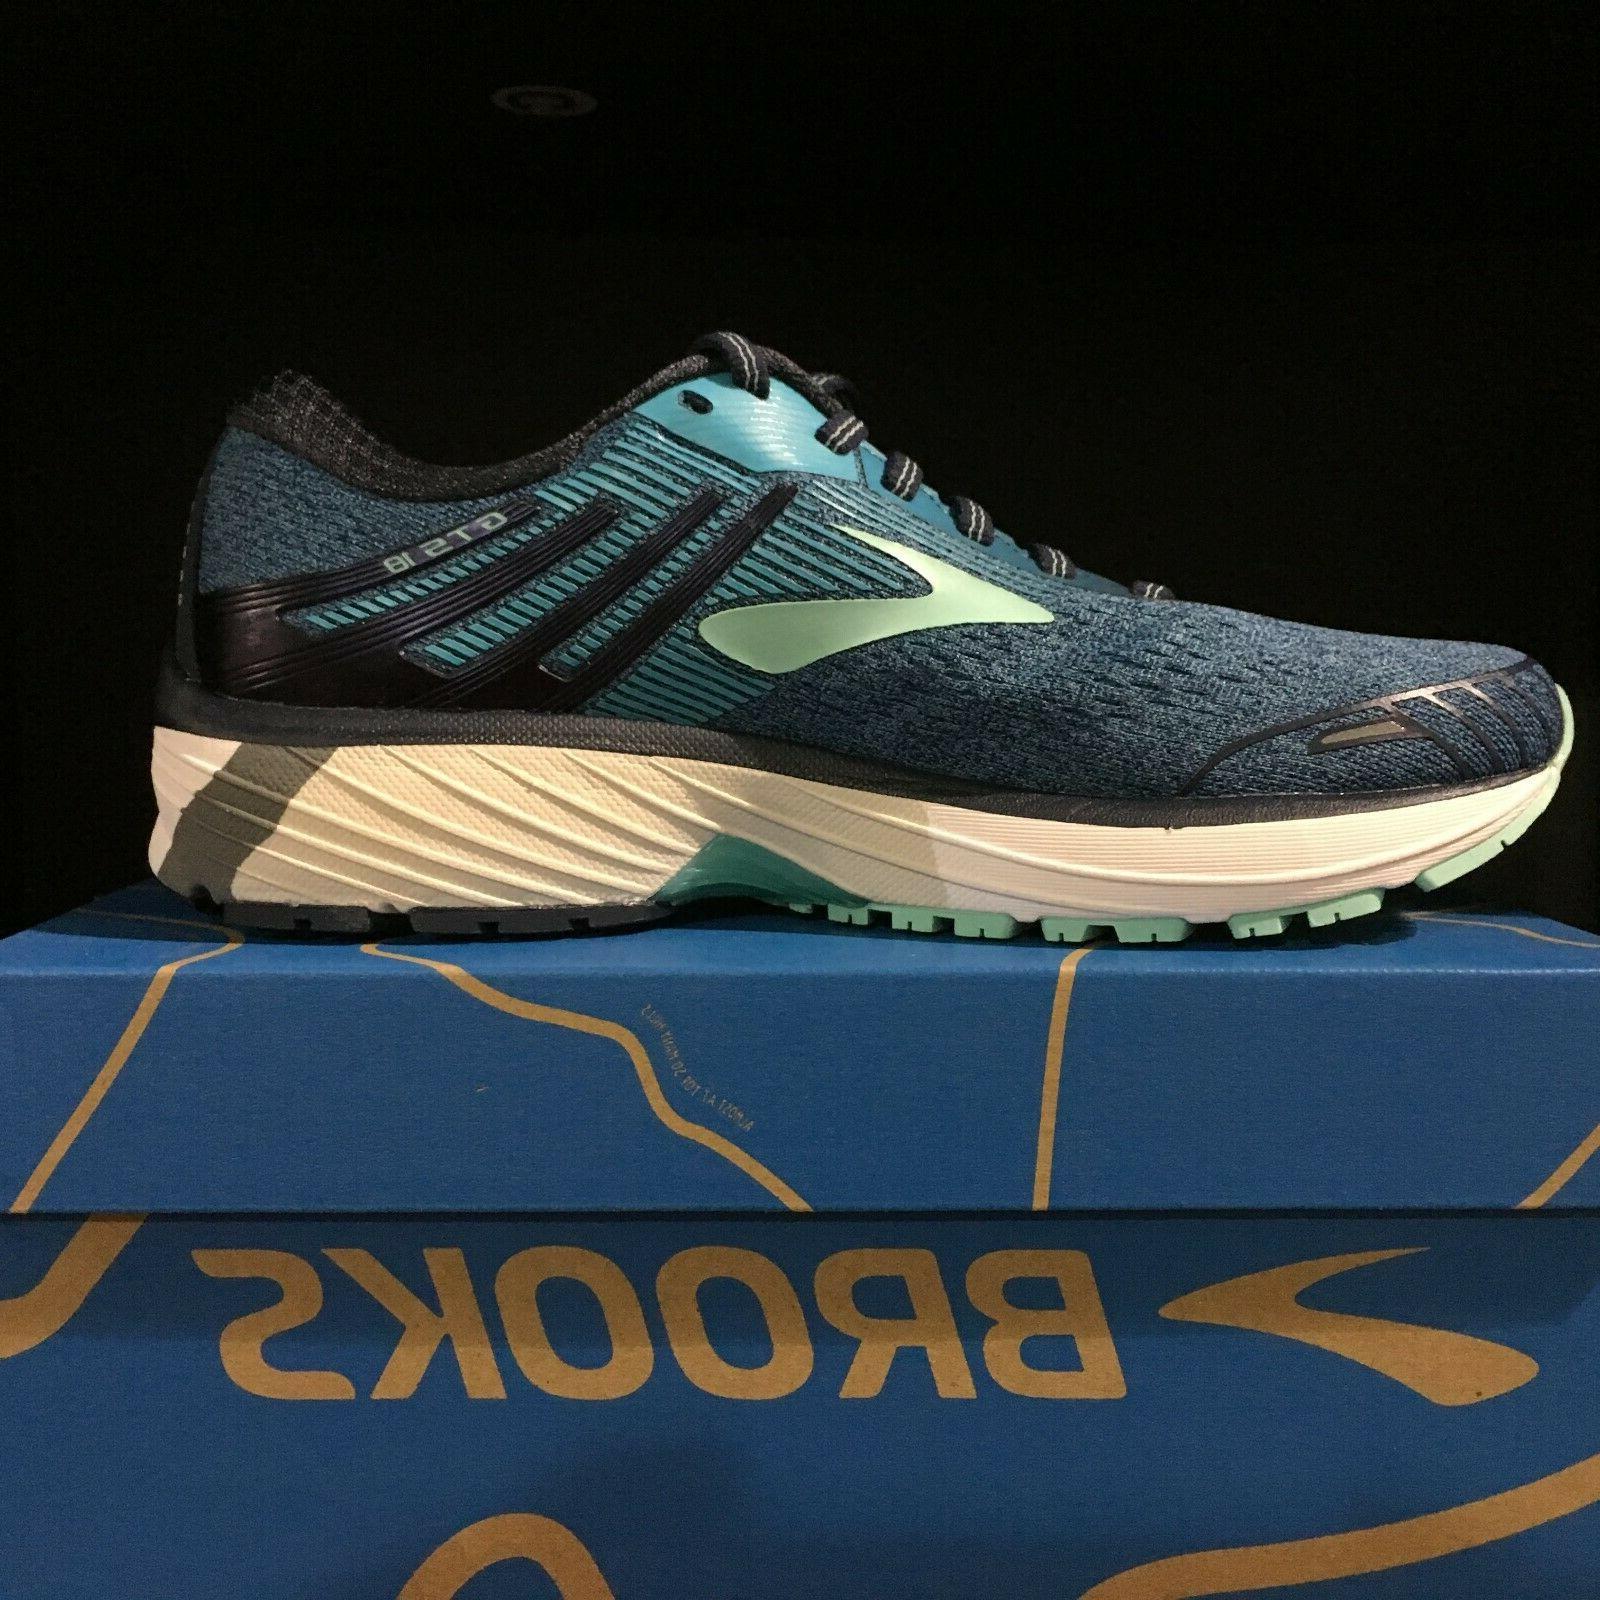 Brooks Adrenaline 18 Shoes Teal 495